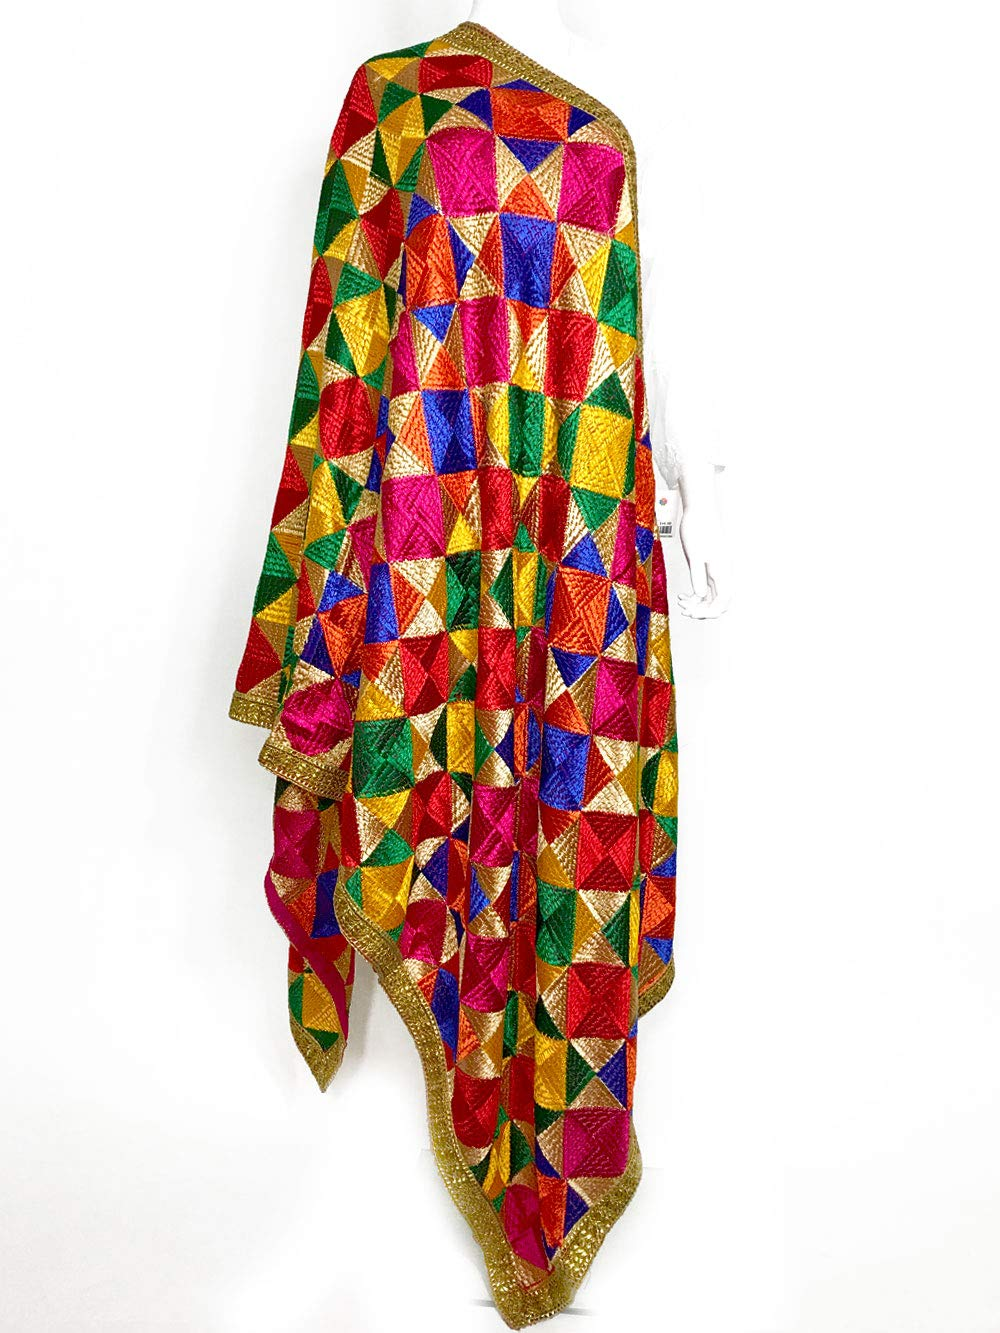 PinkPhulkari California Indian Heavy Embroidered Multi Color Phulkari Dupatta for Women/Border Scarf Shawl/Chunni